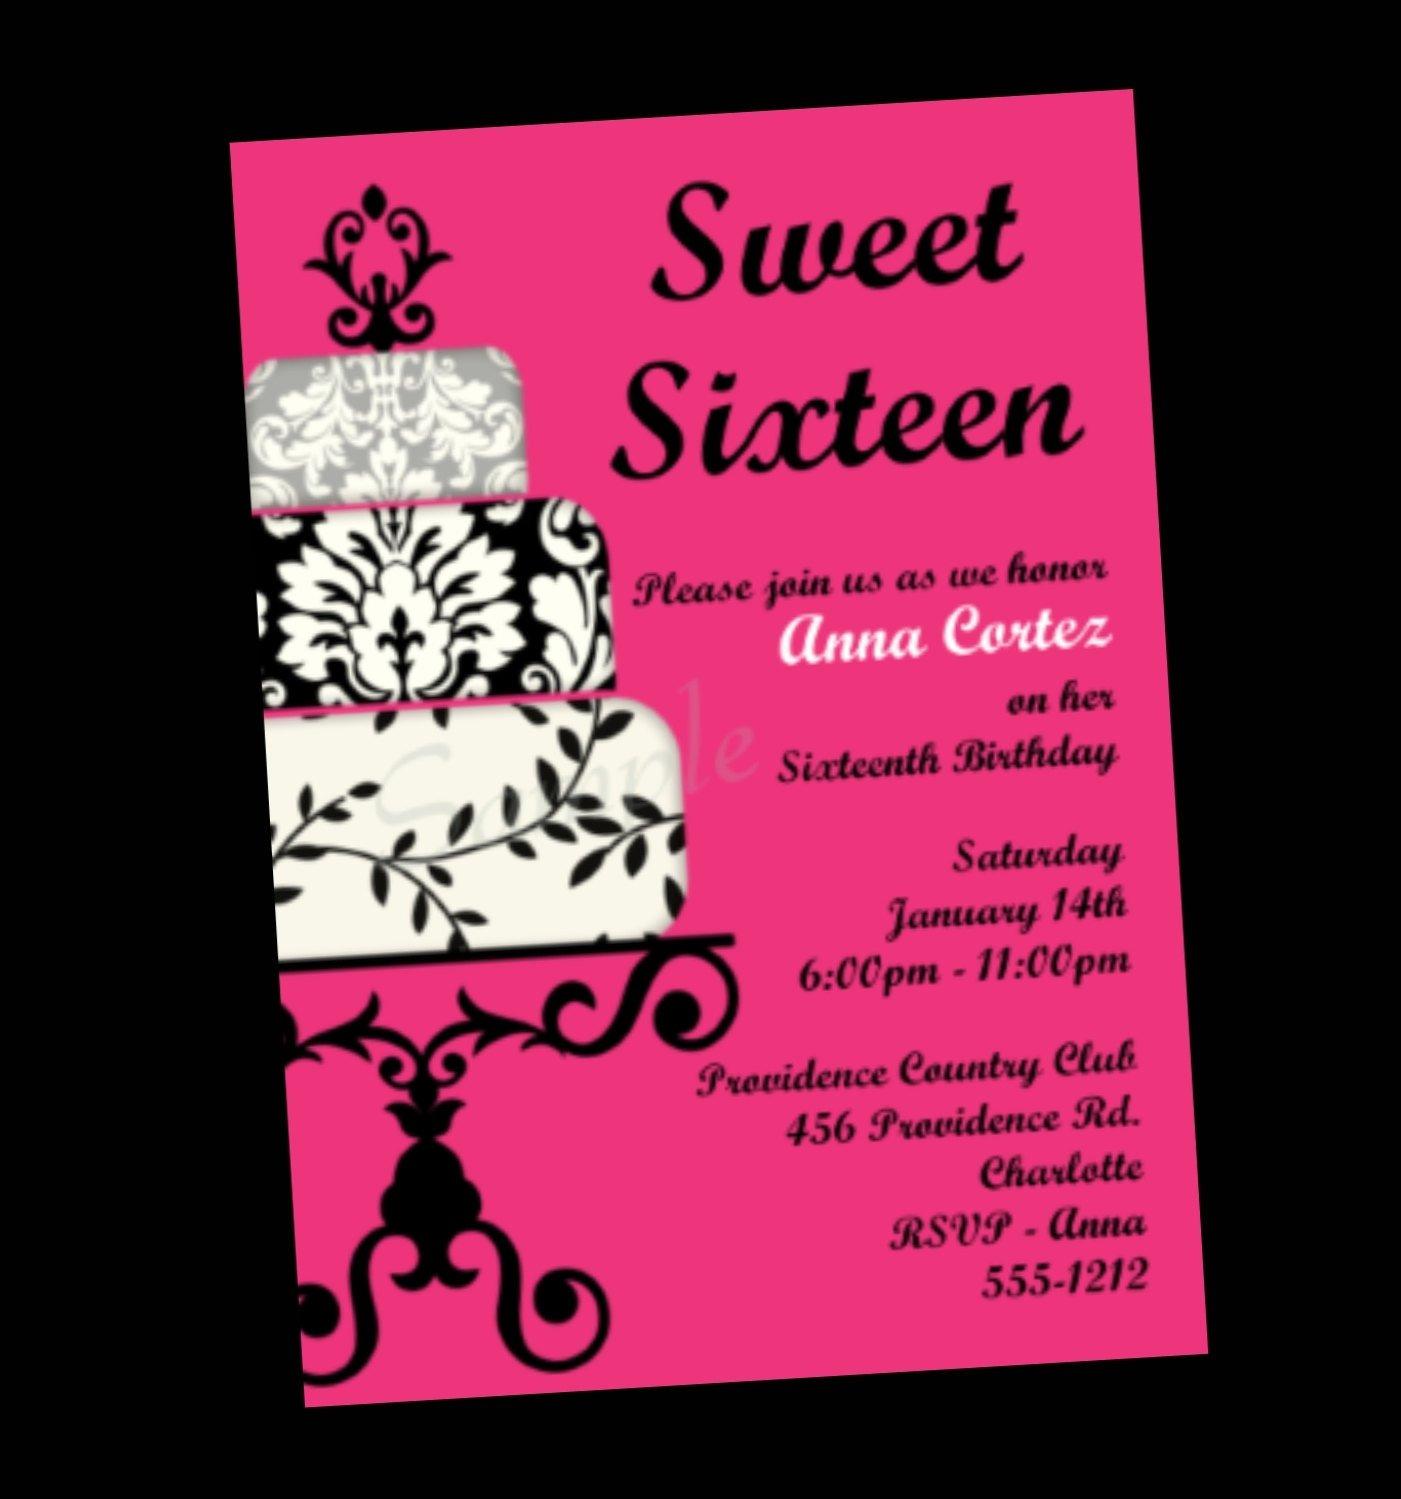 Sweet Sixteen Invitations Templates Sweet 16 Invitation Quotes Quotesgram